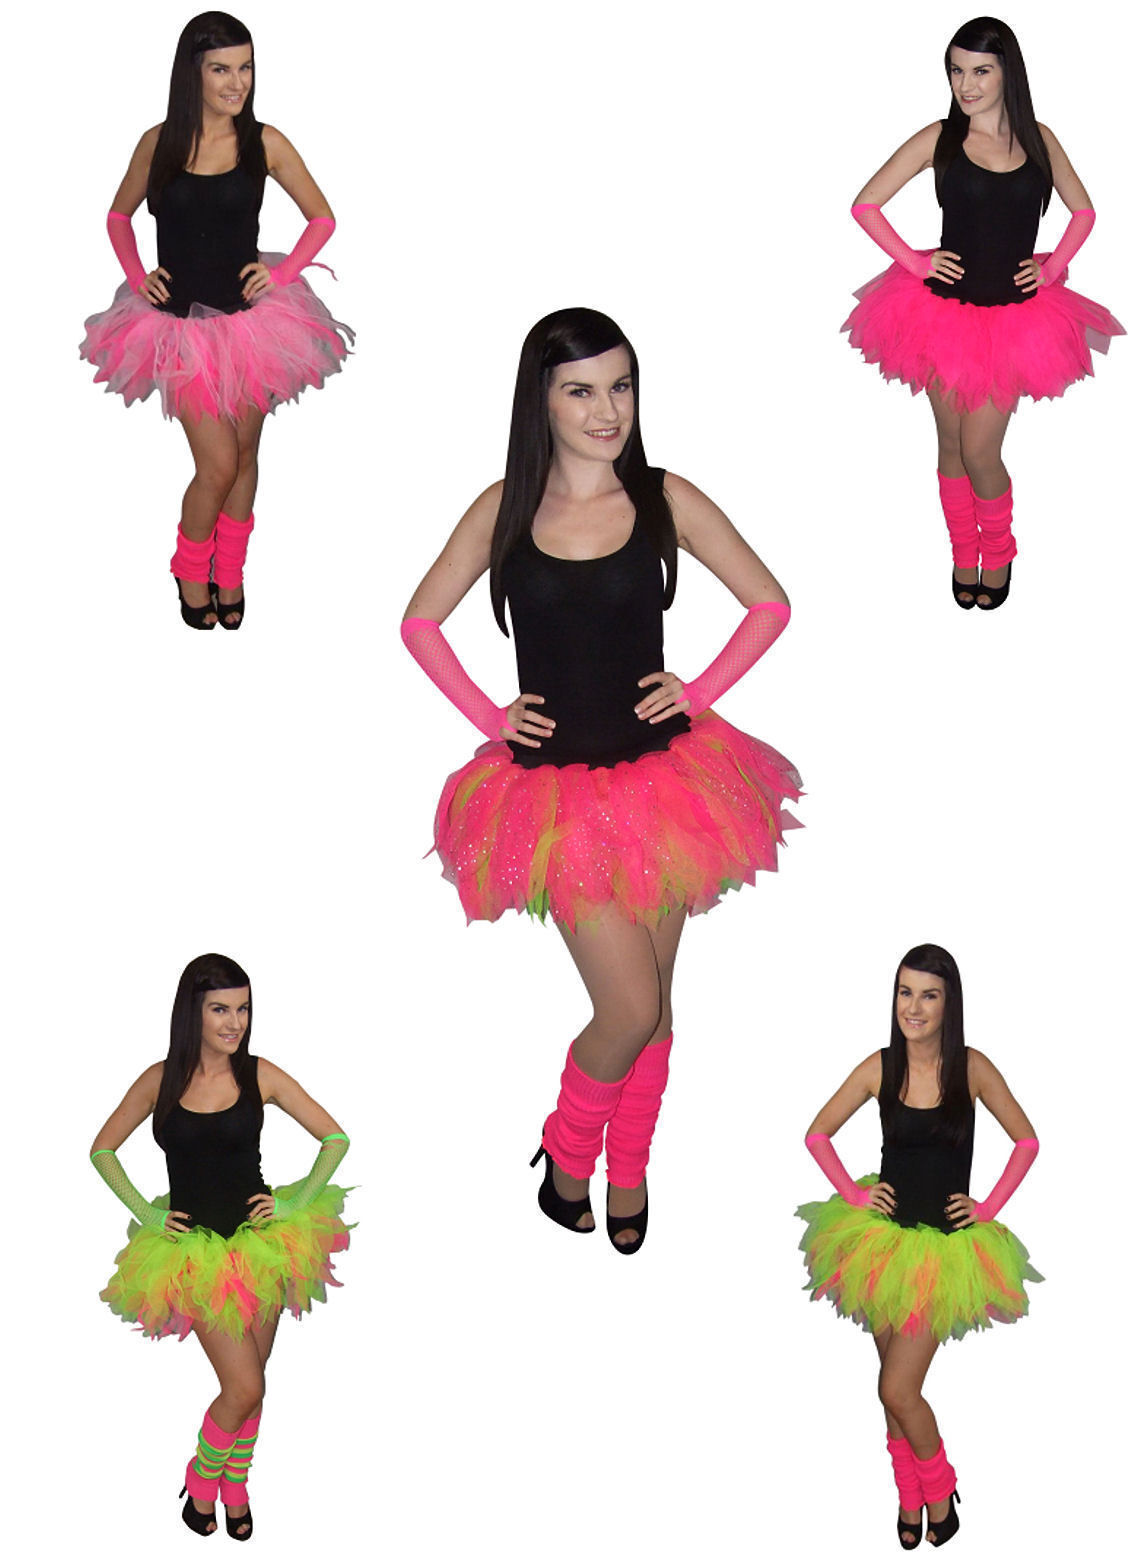 f884b8fcbd6f3 NEON PINK TUTU SKIRT 80S FANCY DRESS HEN PARTY FUN RUN PLUS SIZE DANCE CLUB